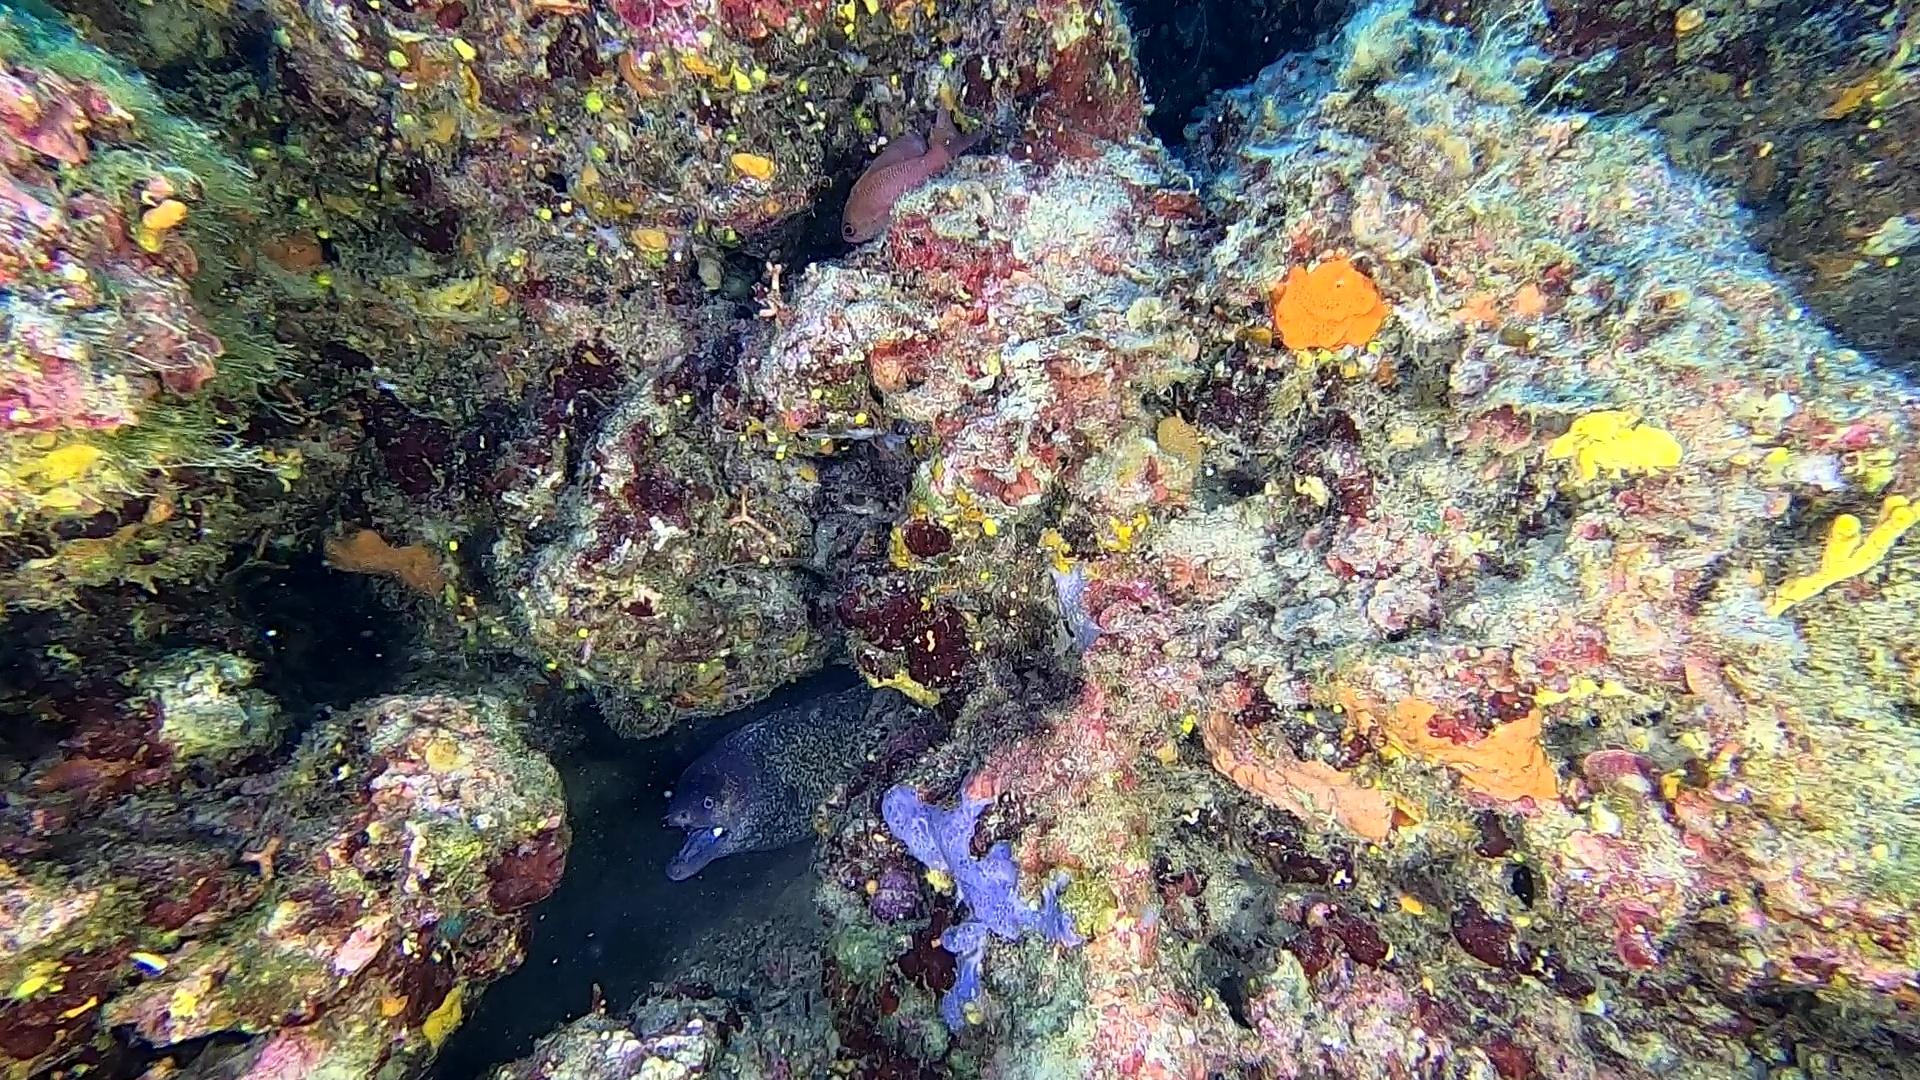 Moray eel Murena helena www.intotheblue.it